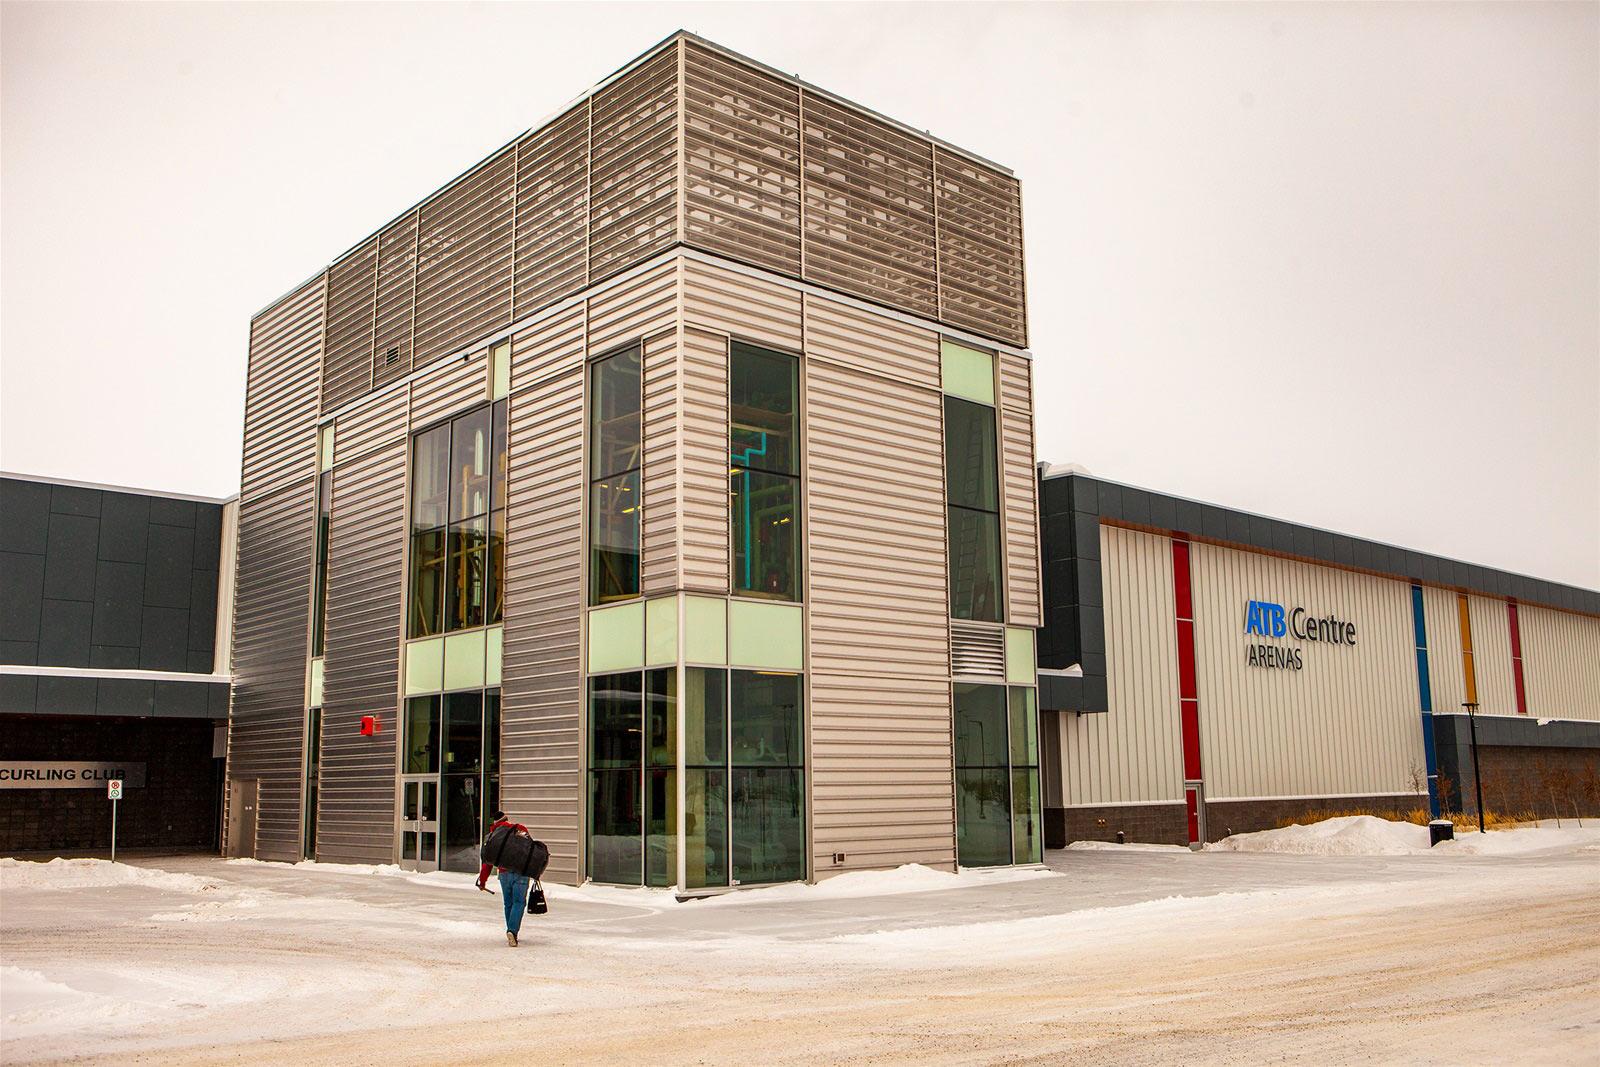 ATB Centre in Lethbridge, Alberta : Sports & Recreation